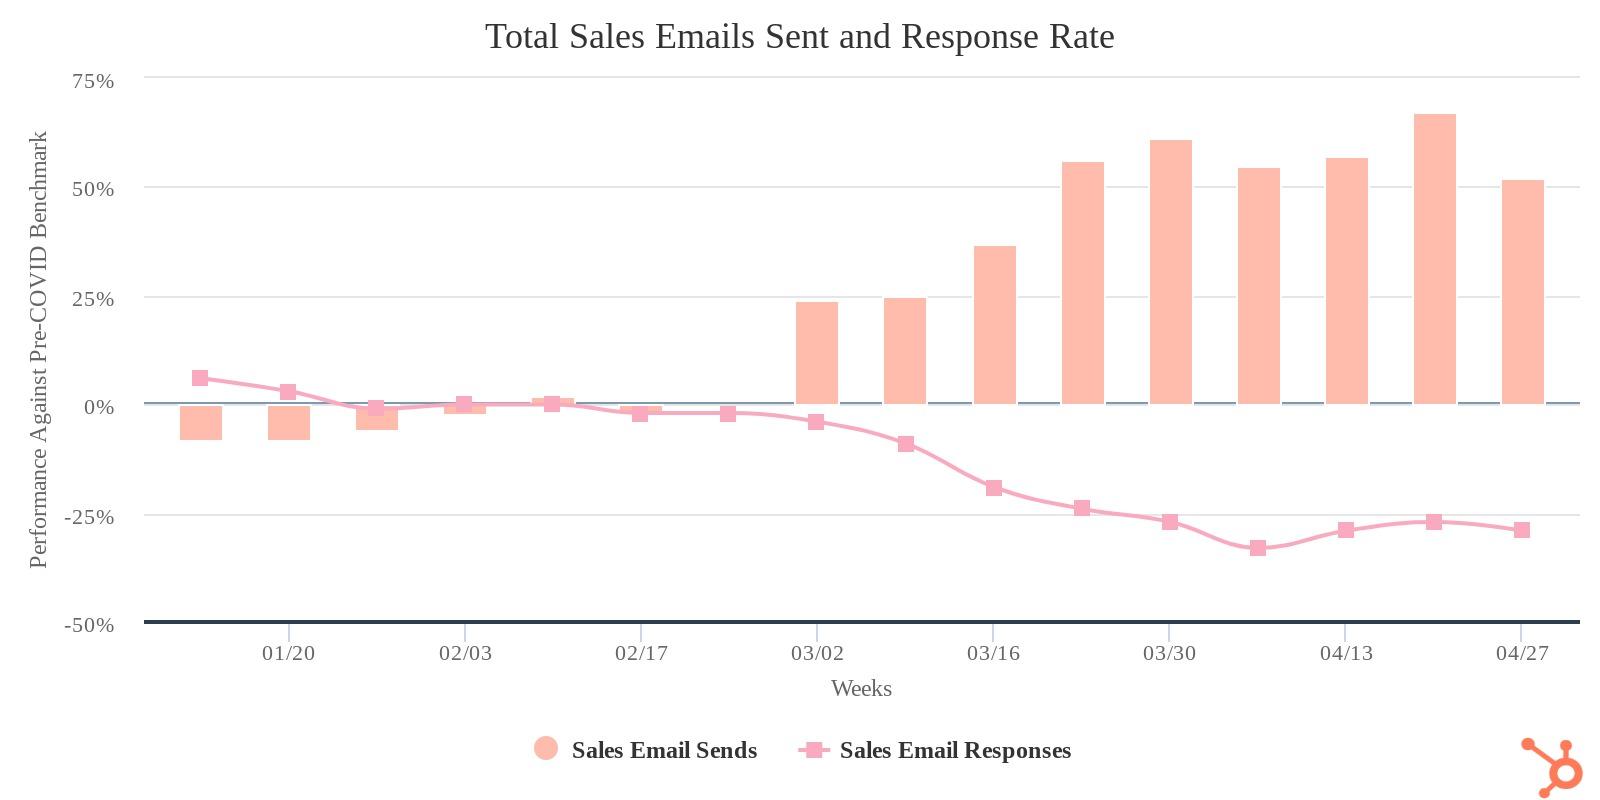 grafico-emails-enviados-hubspot